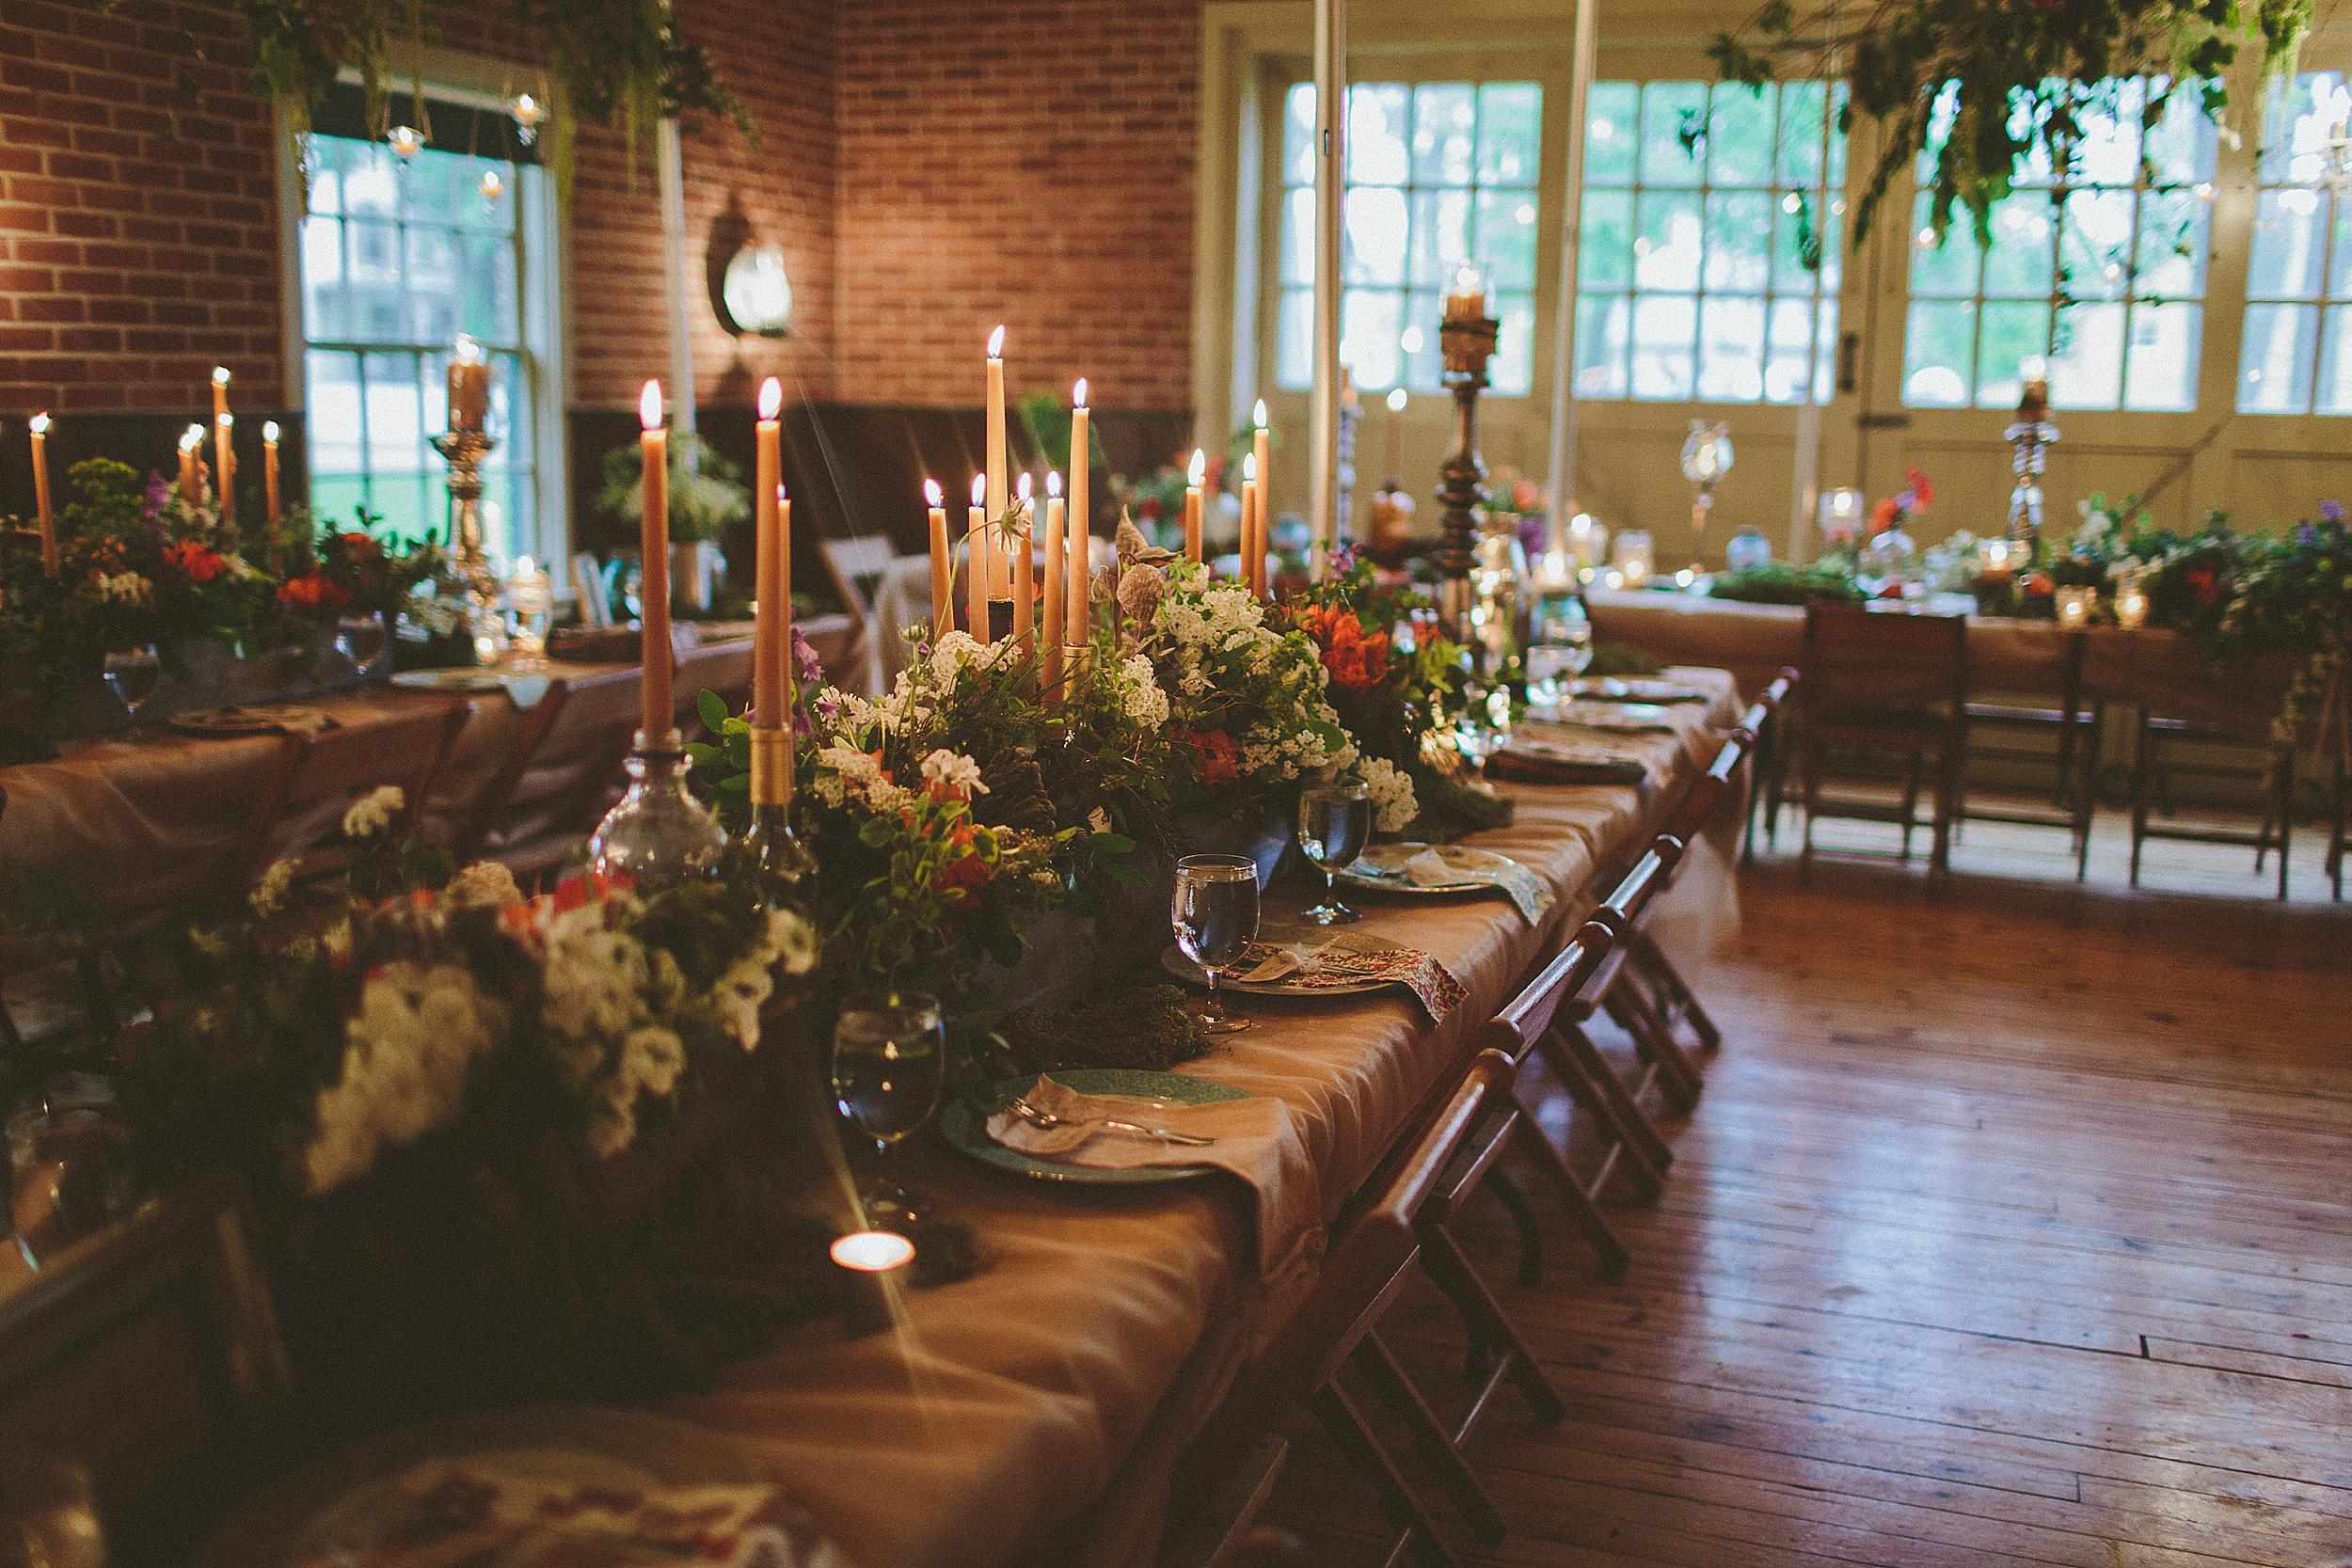 tara_jason_wedding_landis_valley_museum_with_love_and_embers-207.JPG